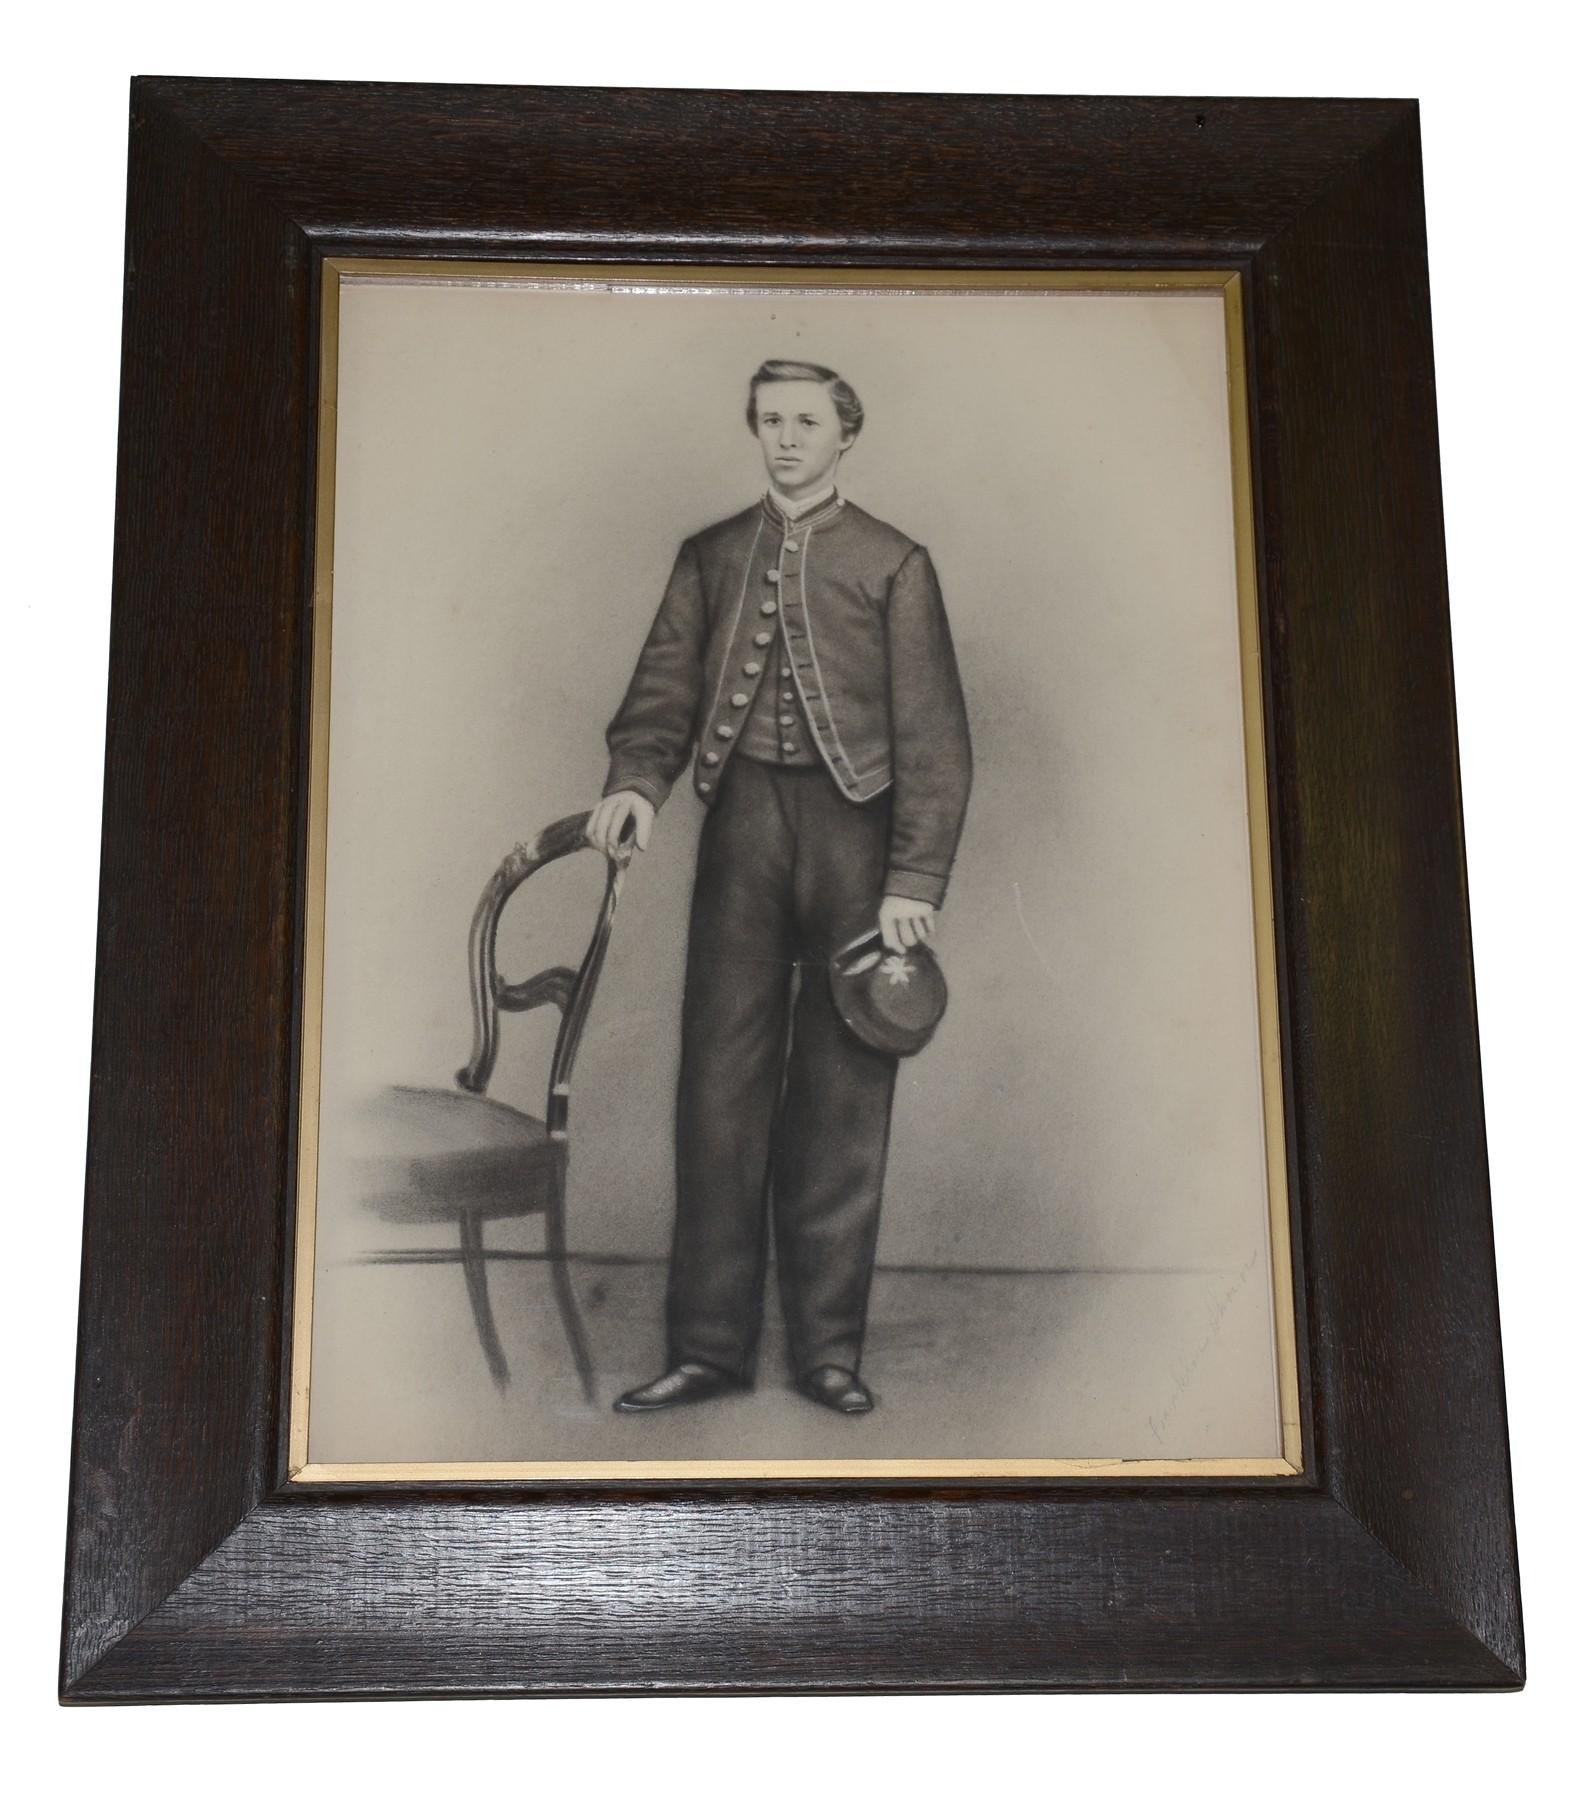 Wonderful framed pencil sketch of 15th pennsylvania cavalry trooper